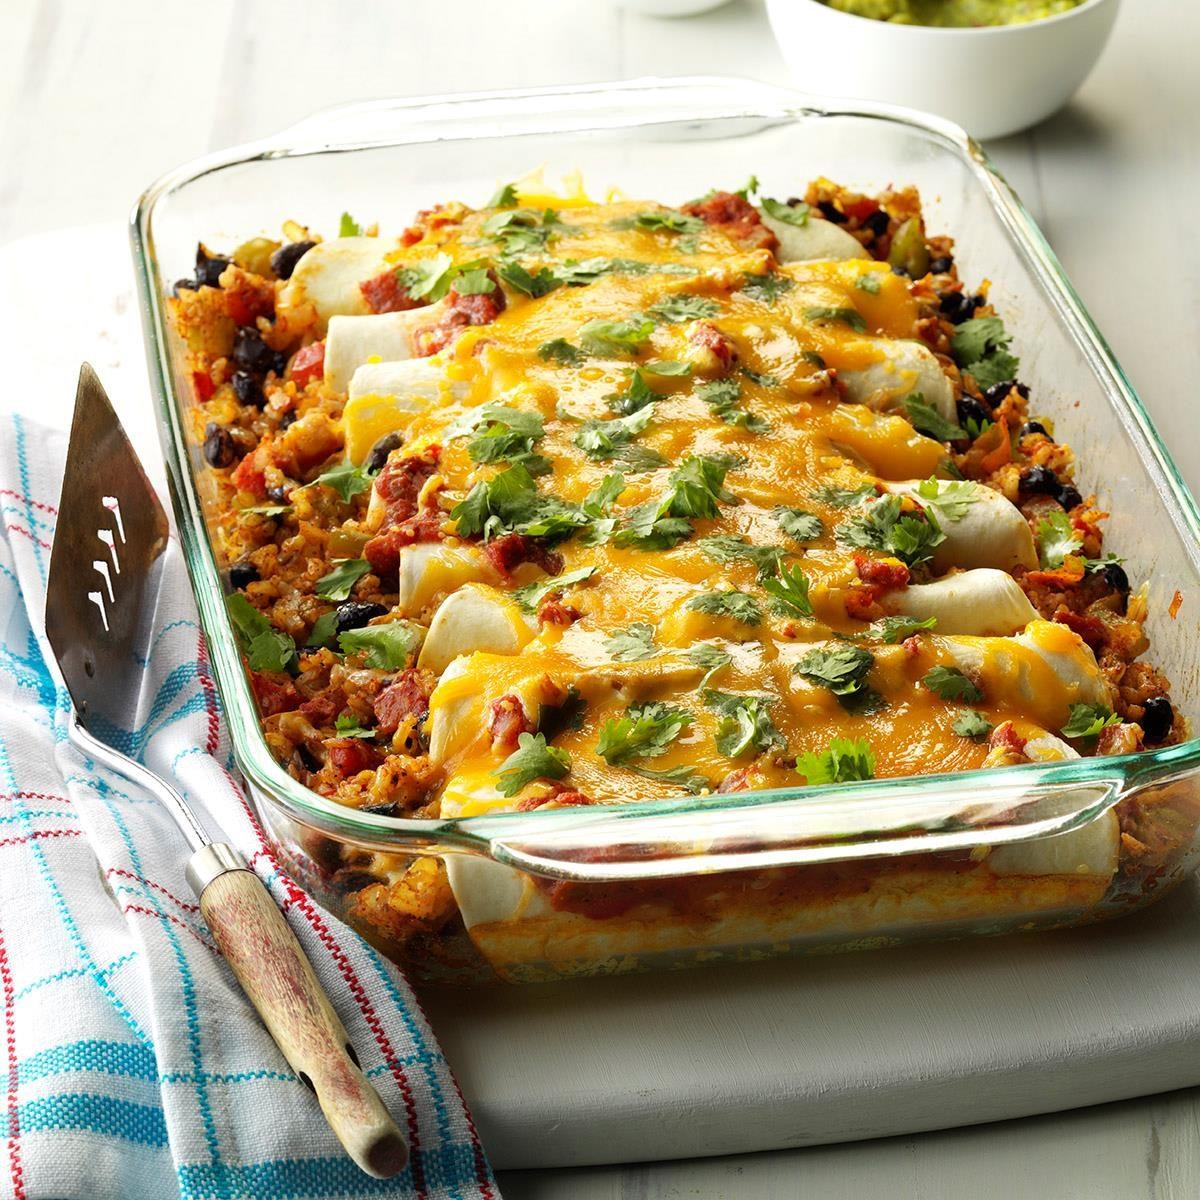 Top 10 vegetarian dinners taste of home black bean and rice enchiladas forumfinder Choice Image